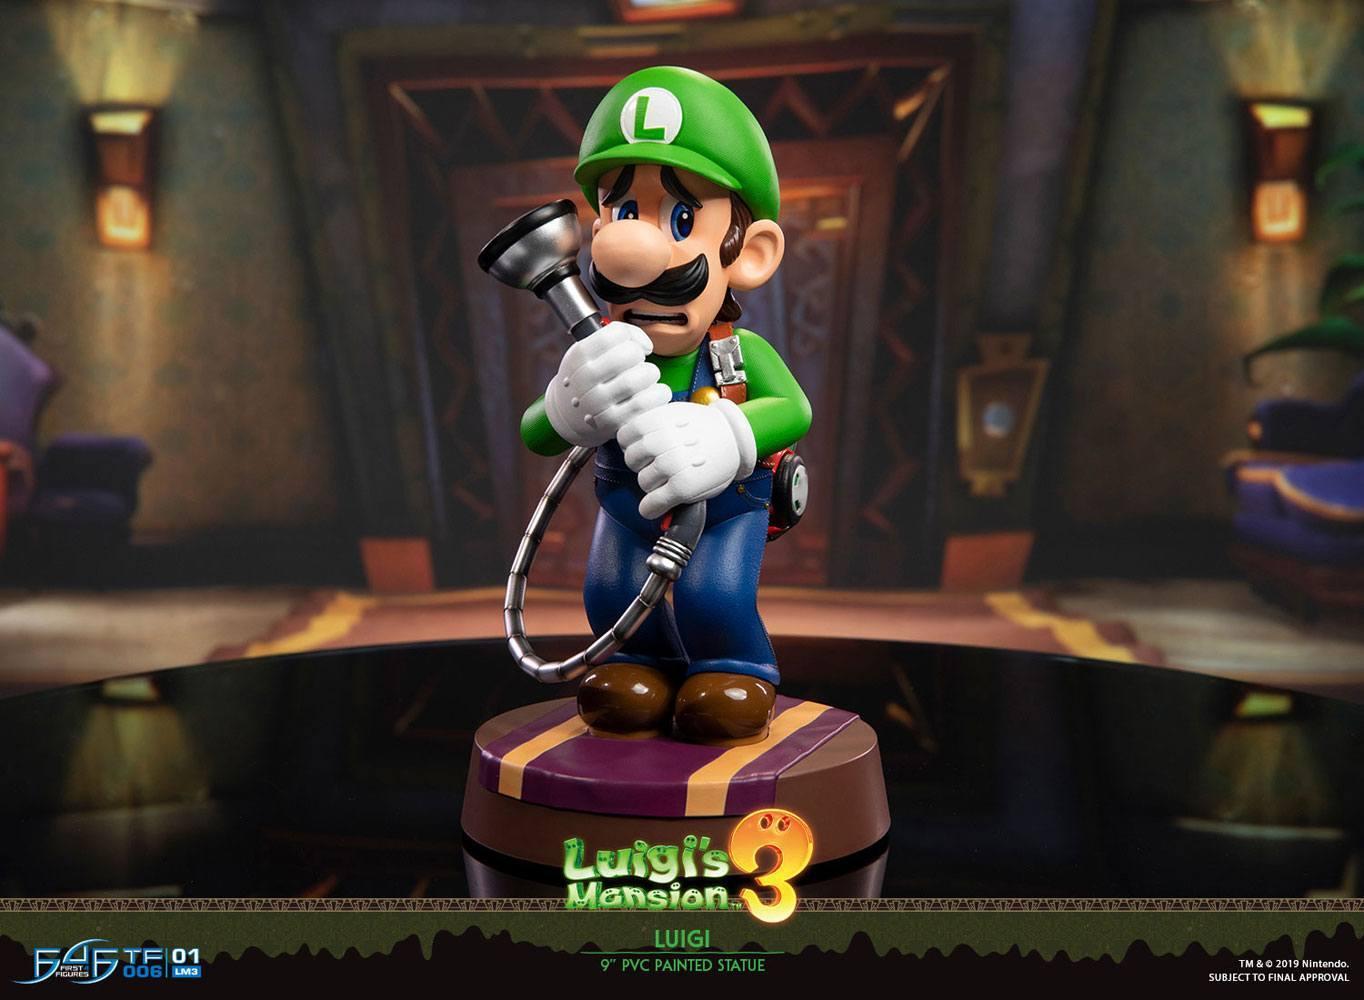 Luigi s mansion fist of 4 figure statuette